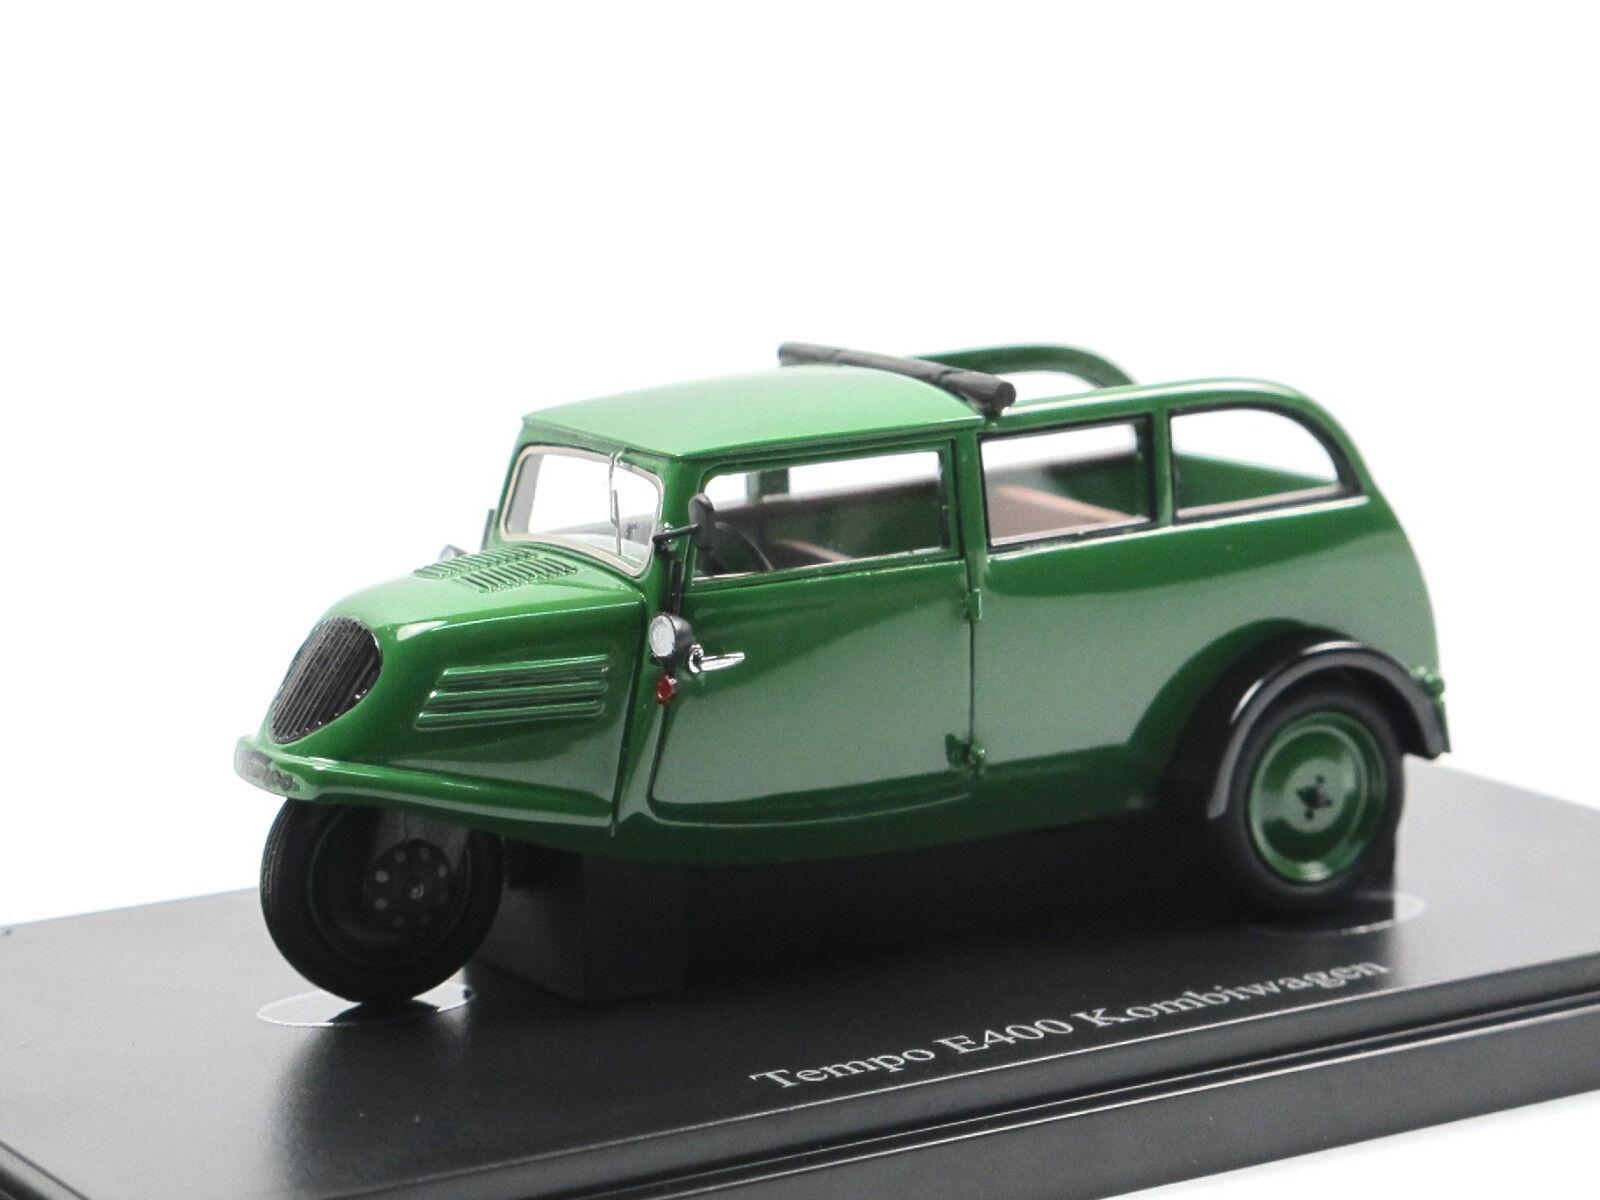 Autocult 02008 - 1936 Vitesse e400 breaks Combinaison Voiture vert 1 43